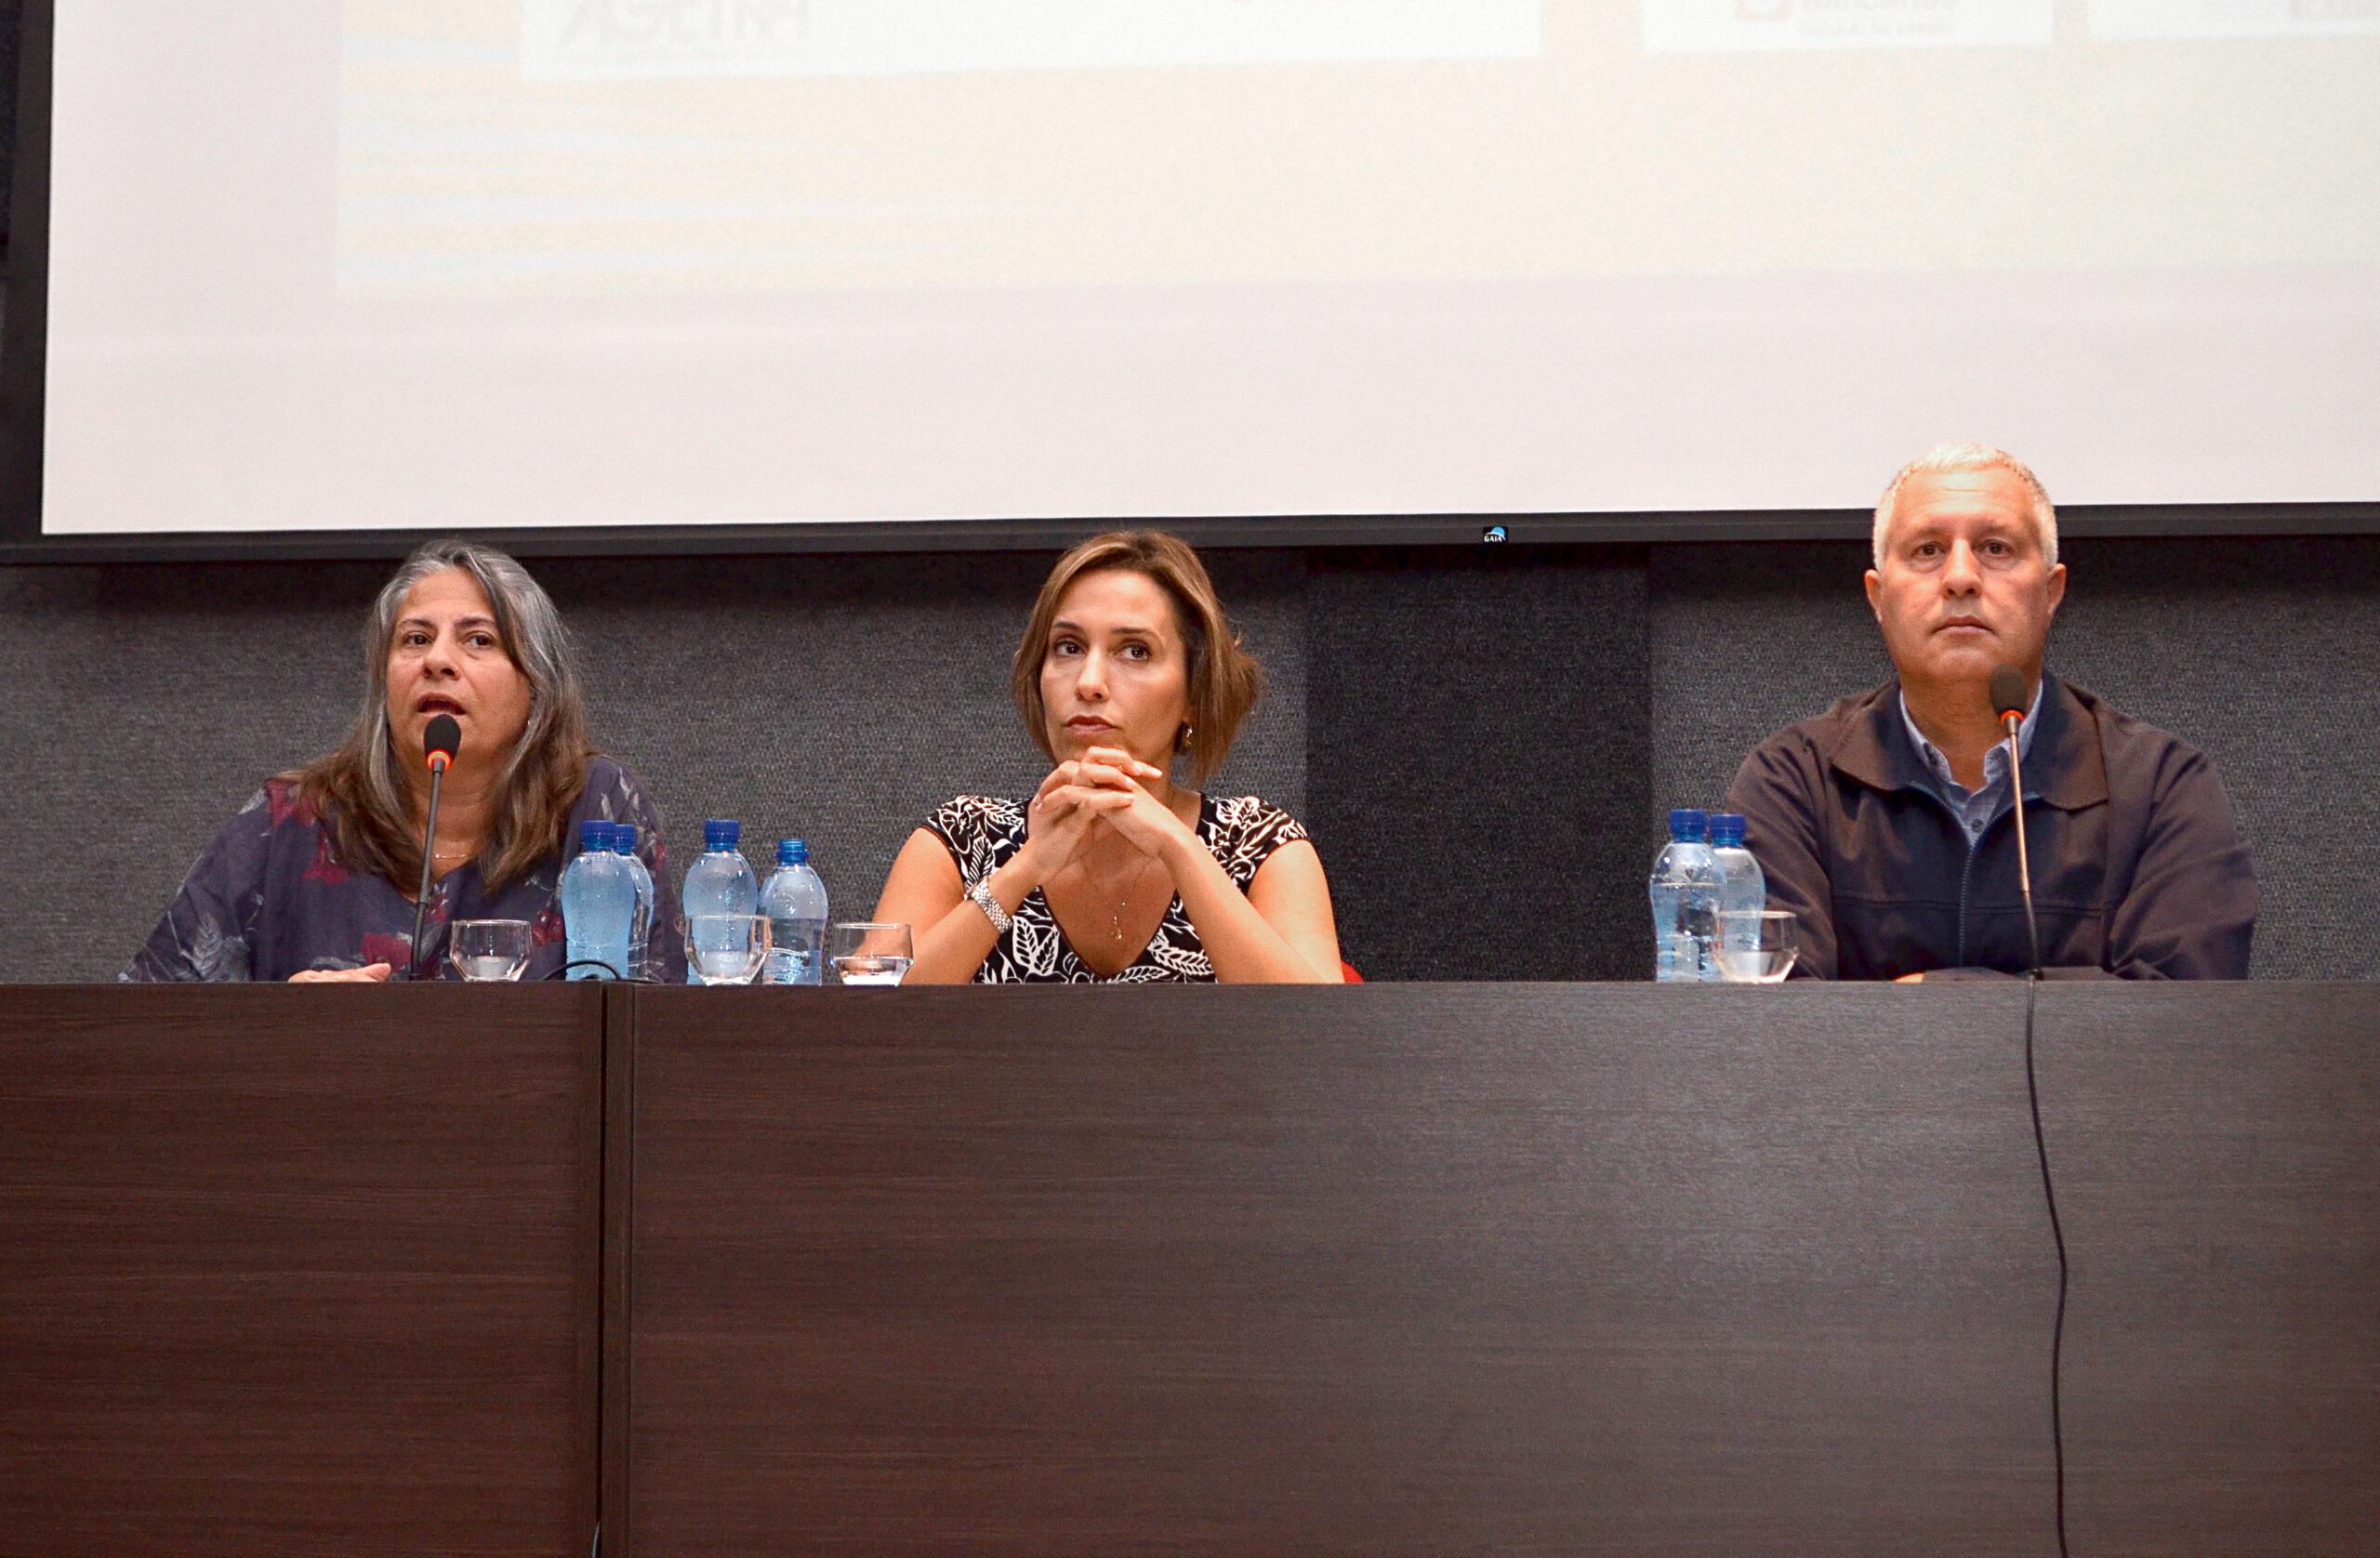 Caxias recebe debate sobre reformas da Previdência e Trabalhista no Dia Nacional de Lutas